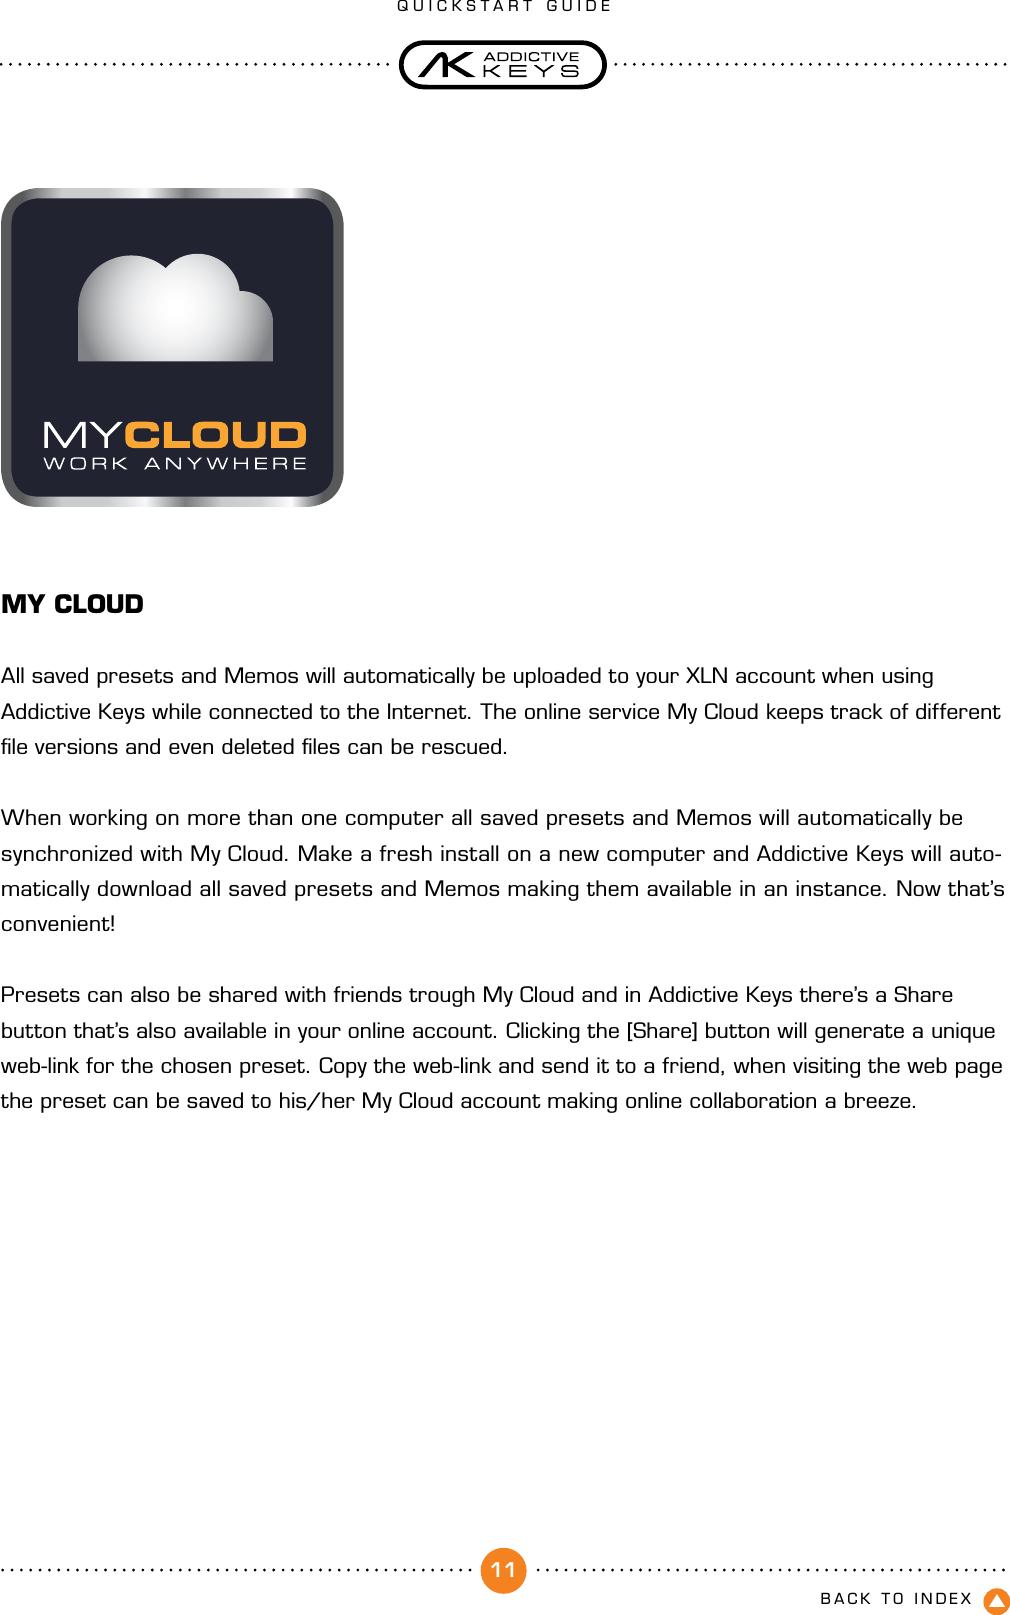 Xln Audio Addictive Keys Quickstart Guide User Manual